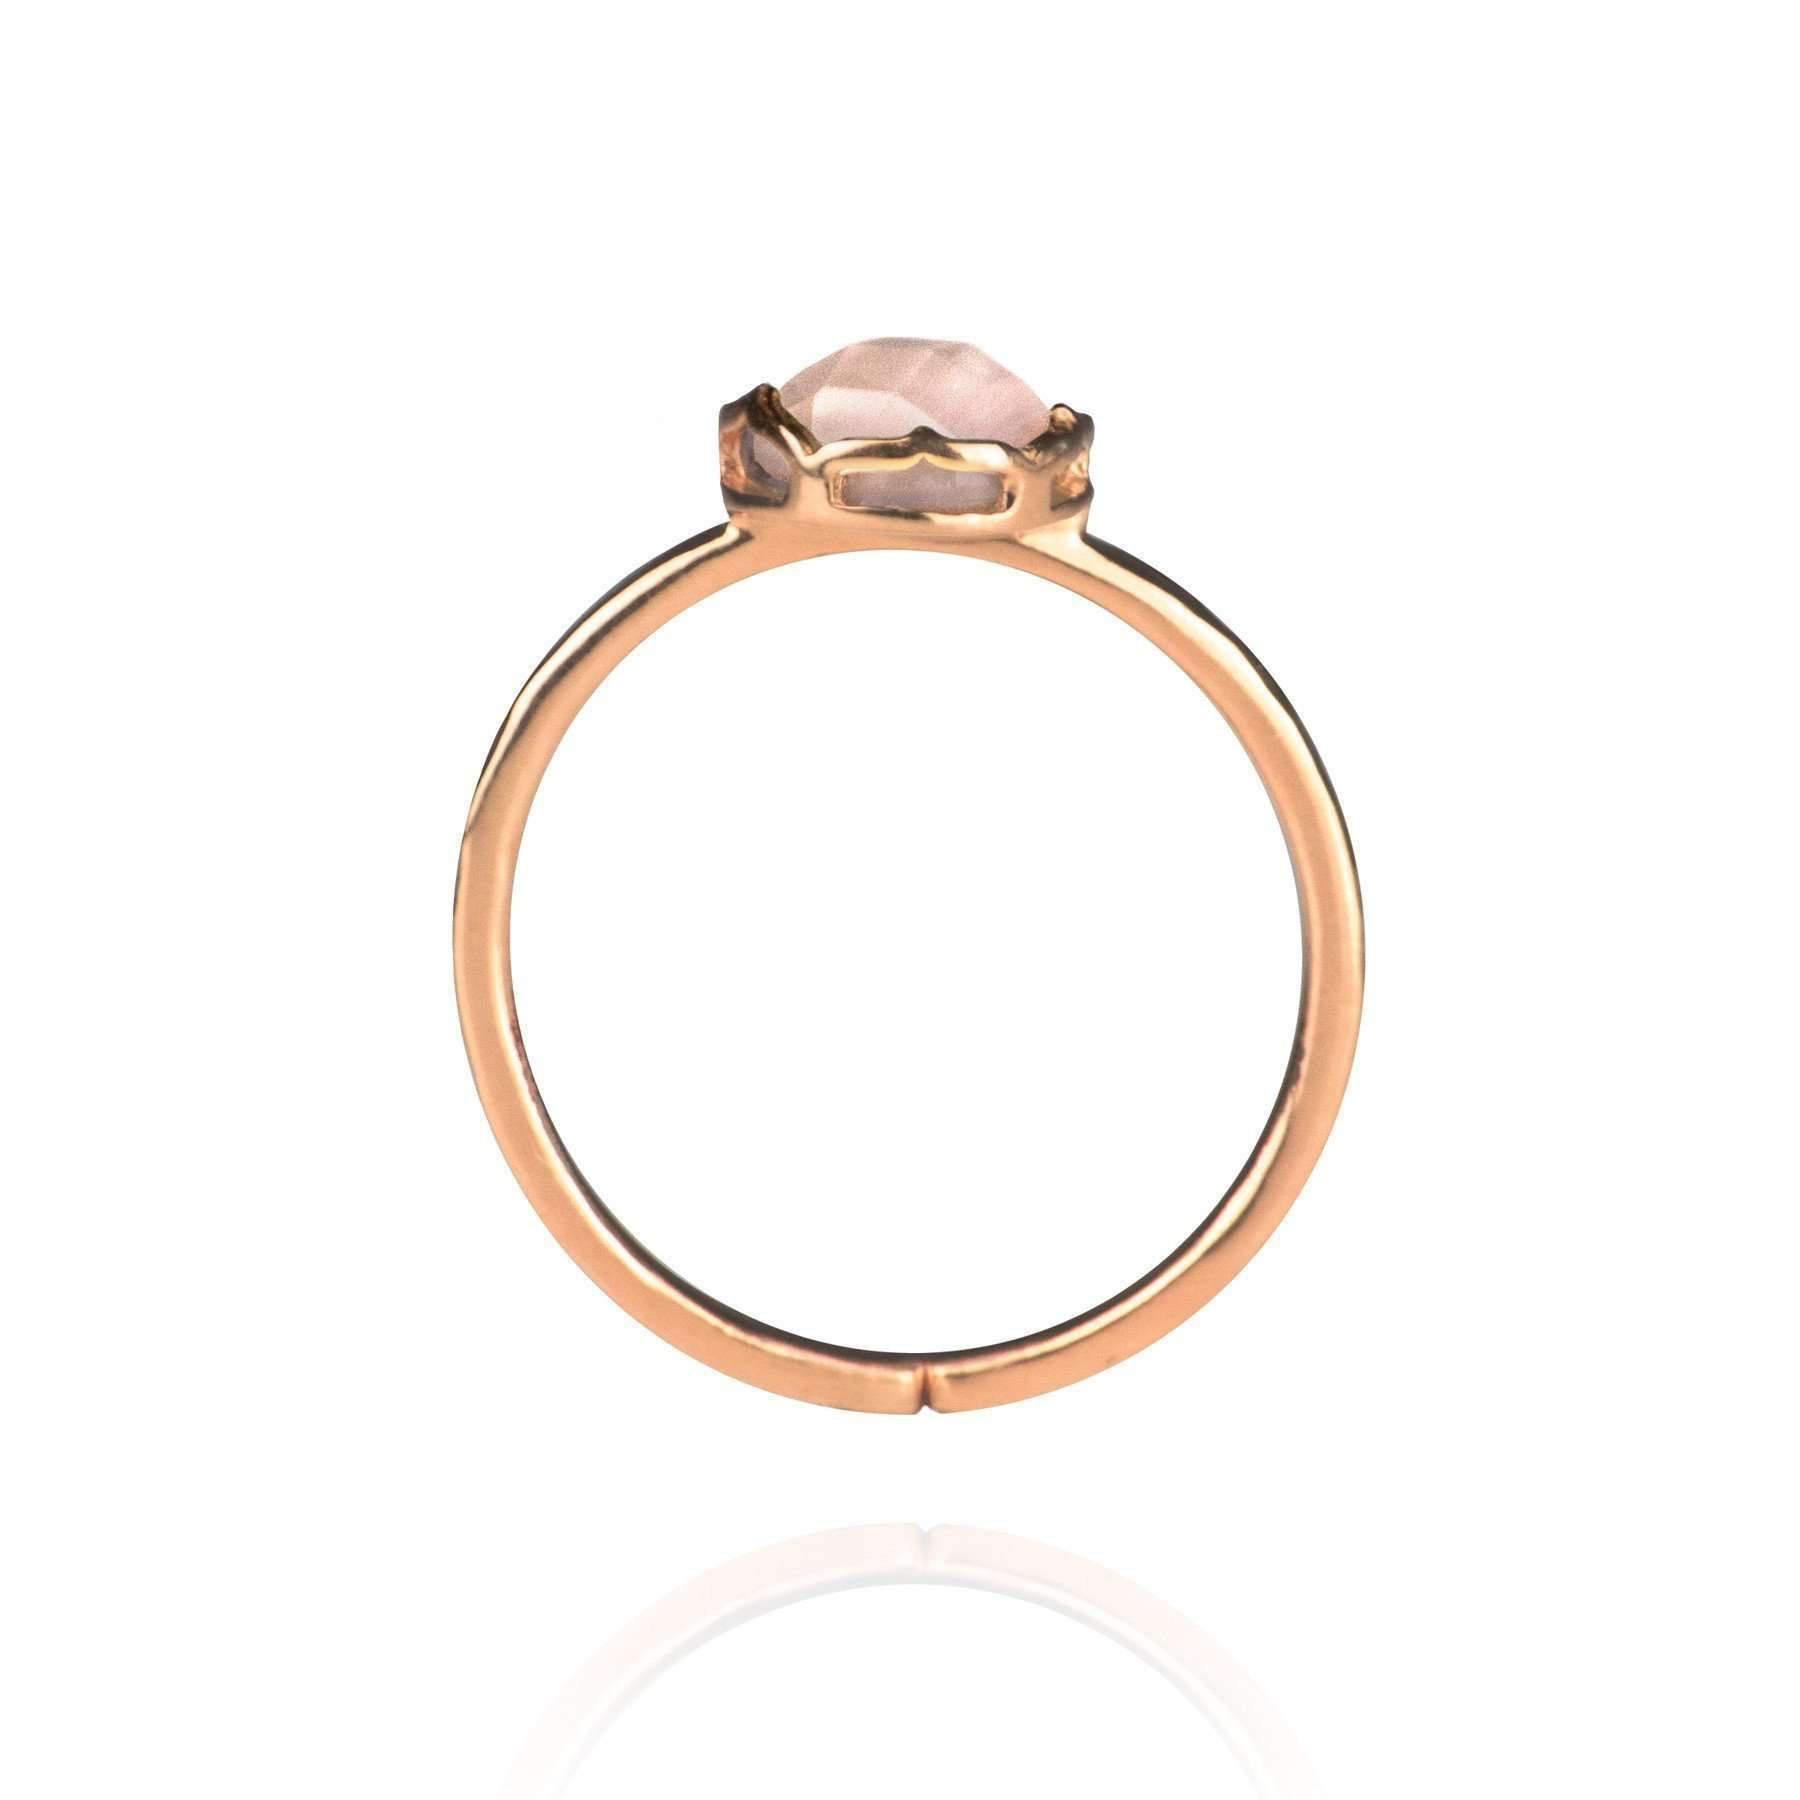 Zefyr Bokeo Ring Rose Gold - UK T 1/2 - US 10 - EU 62 1/4 fFydcAtIdm